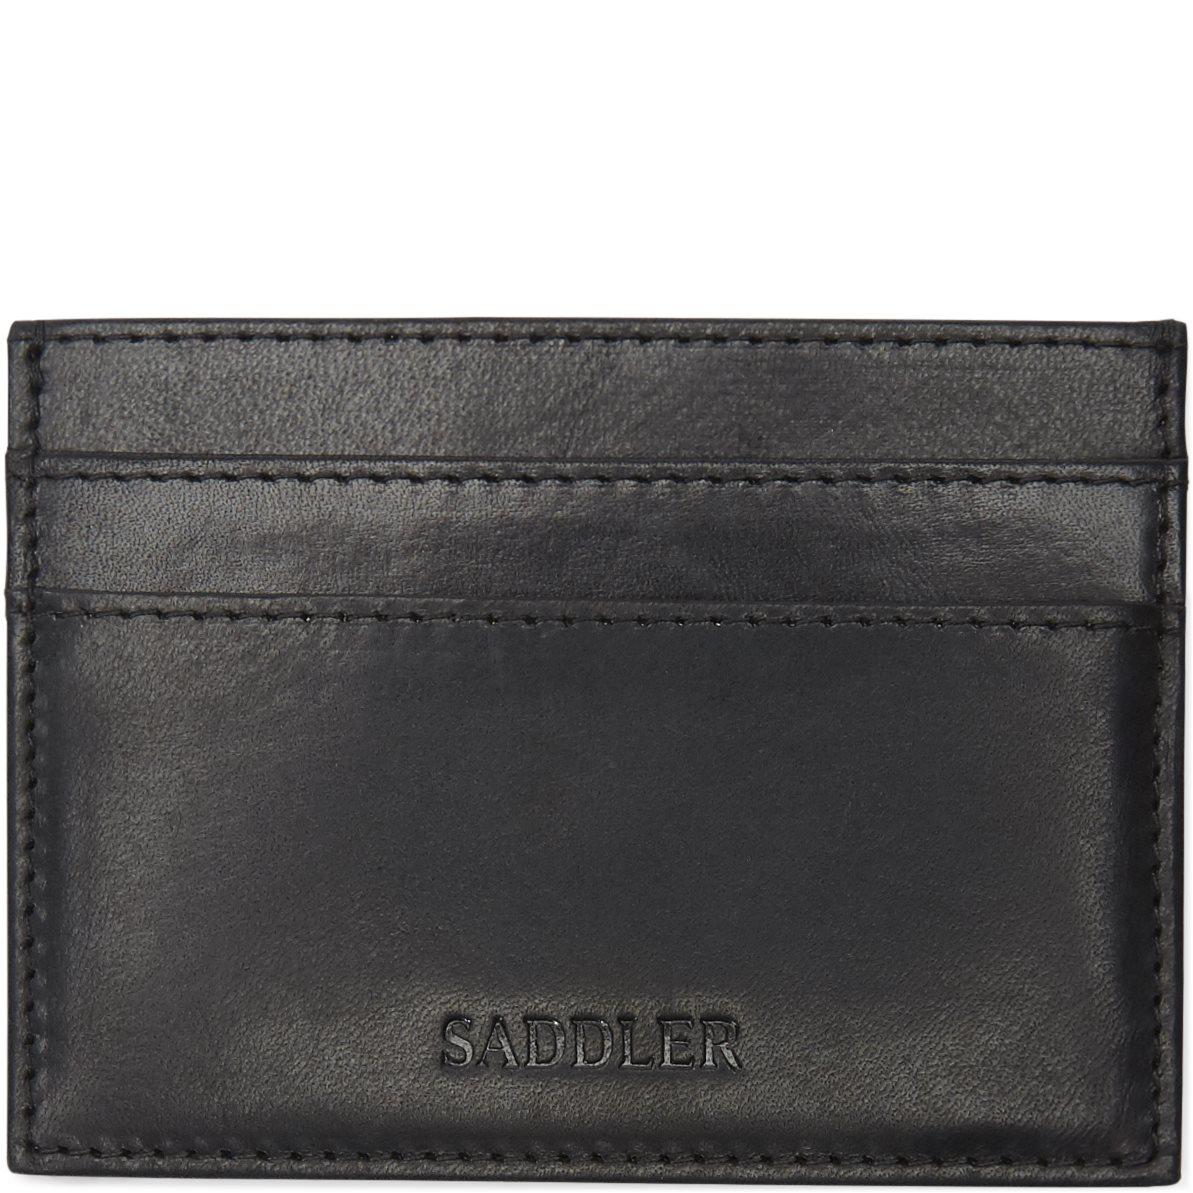 10412 Kreditkortholder - Accessories - Sort